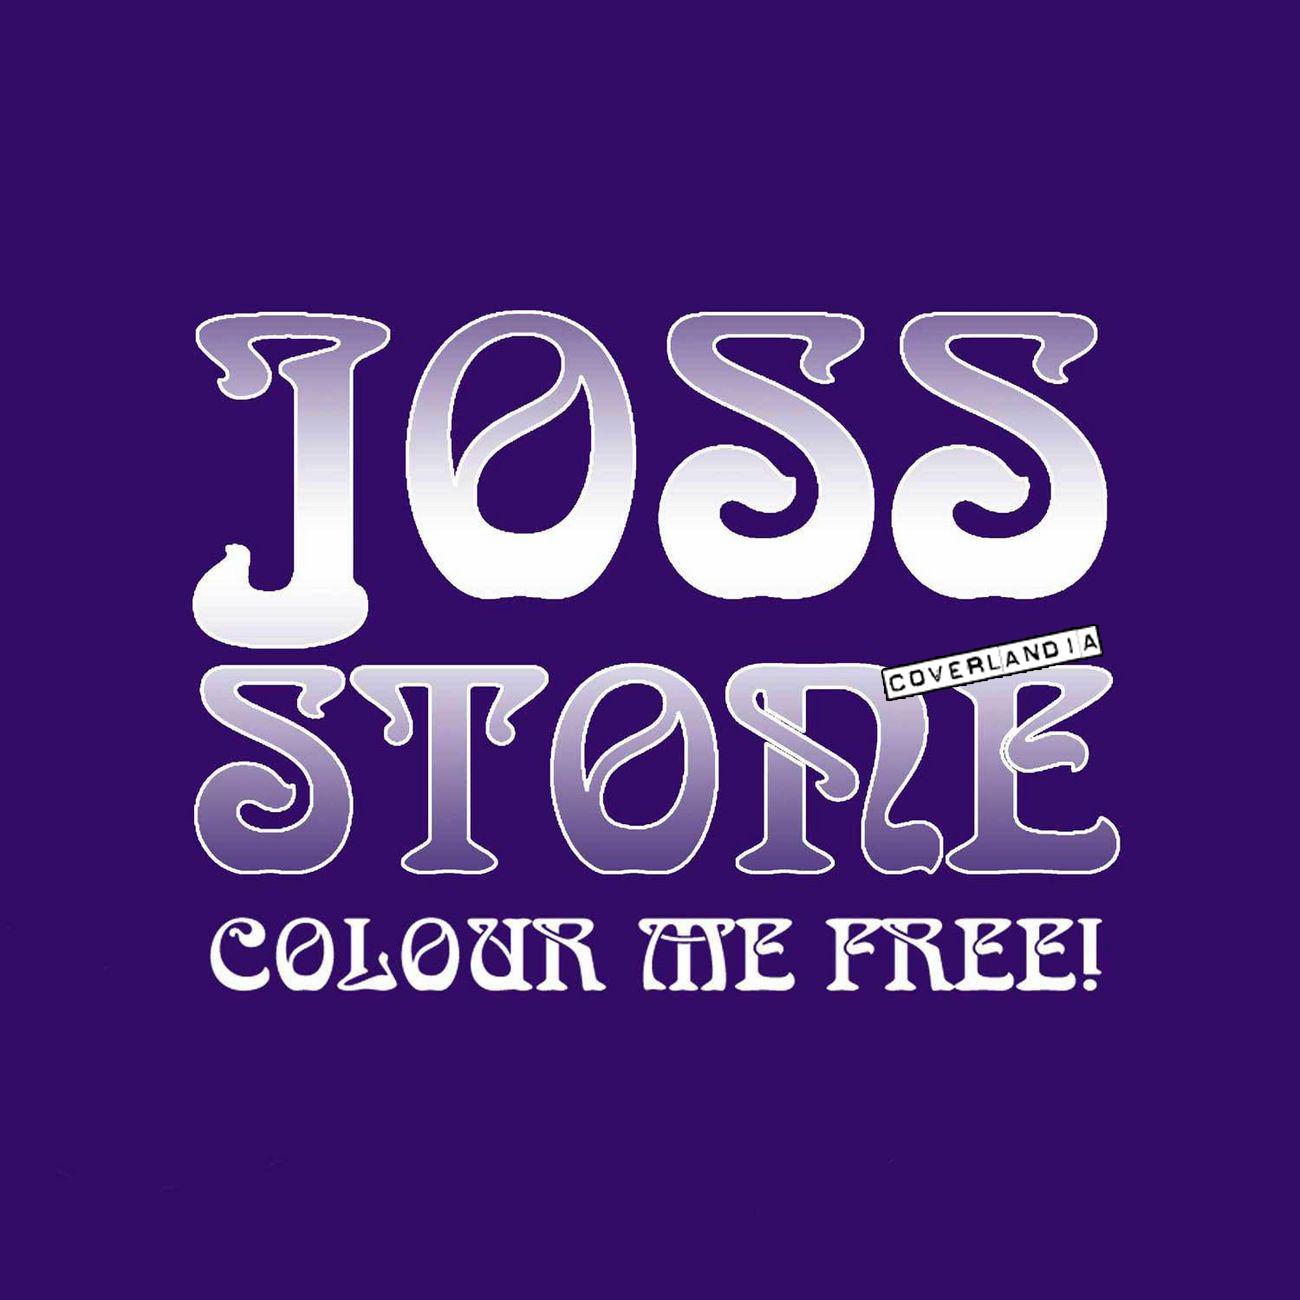 http://3.bp.blogspot.com/-U9QauOwS7V0/T-E635x0etI/AAAAAAAAALo/ZE0M5vqQL1A/s1600/joss_stone_colour_me_free.png